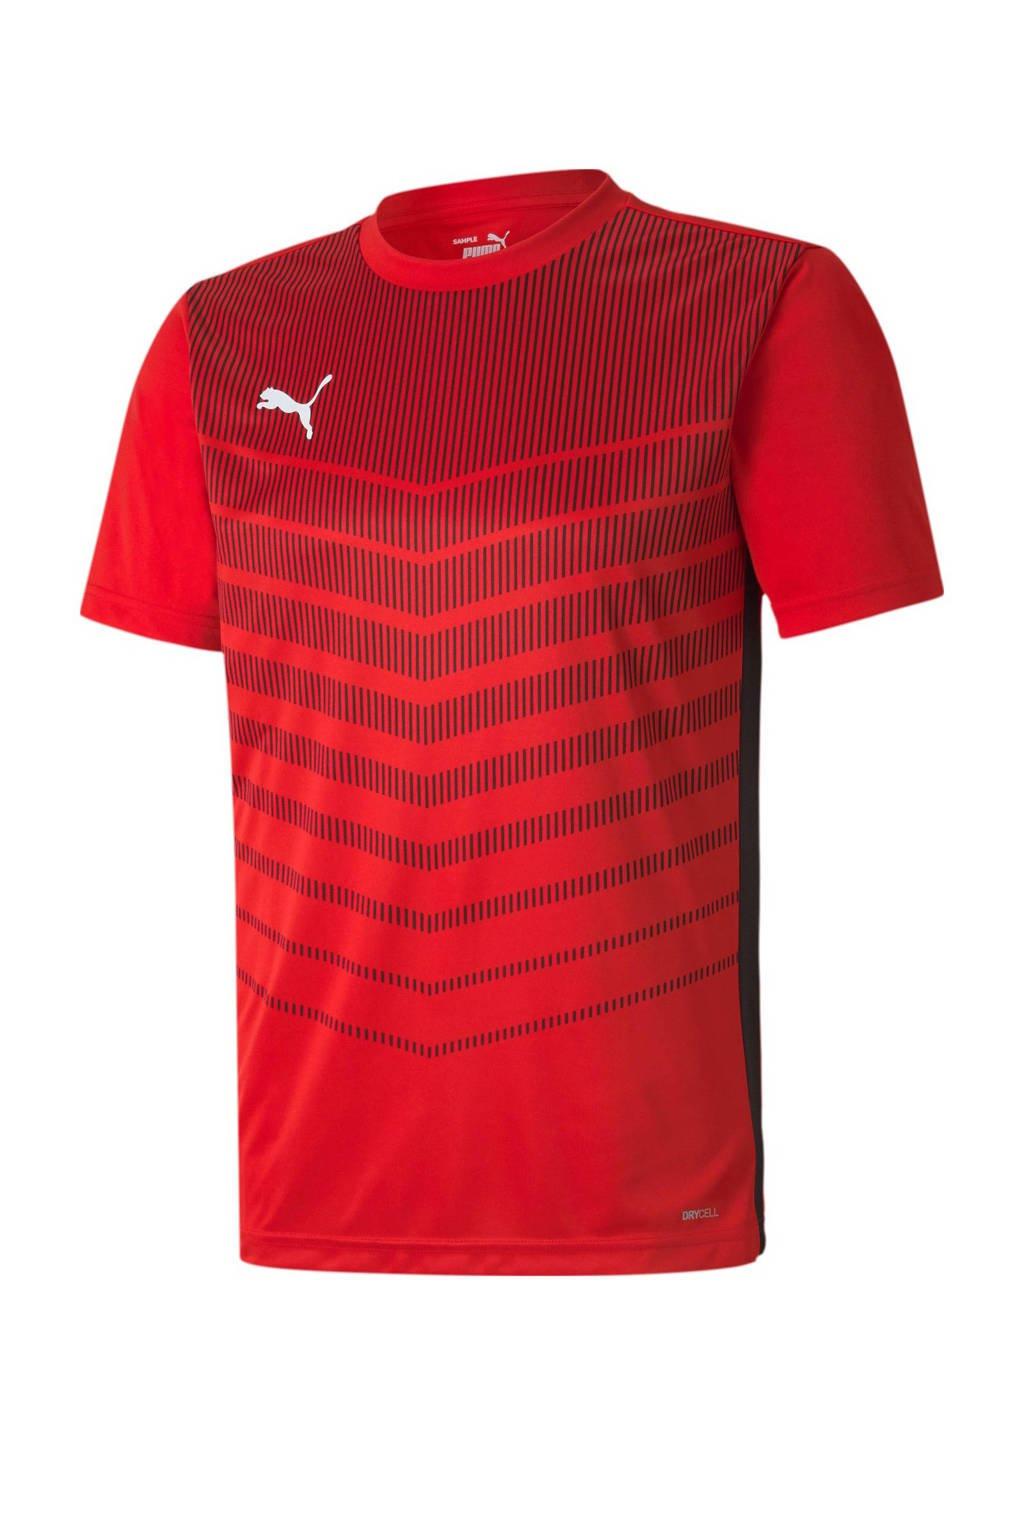 Puma   voetbal T-shirt rood, Rood